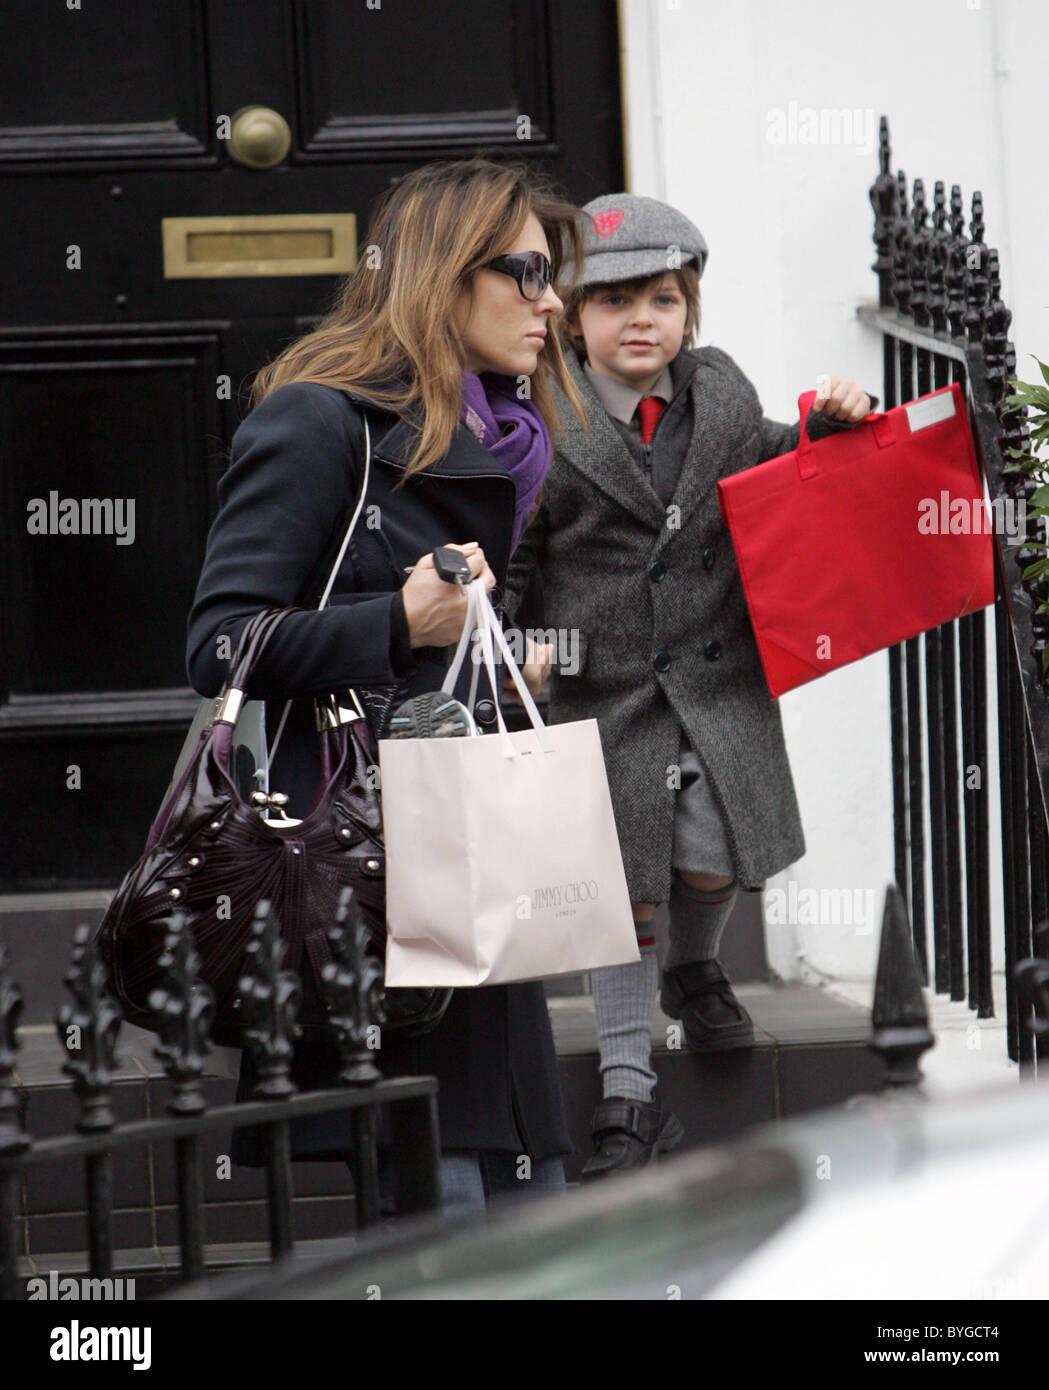 Damian Hurley And Elizabeth Hurley Stockfotos und -bilder Kaufen - Alamy